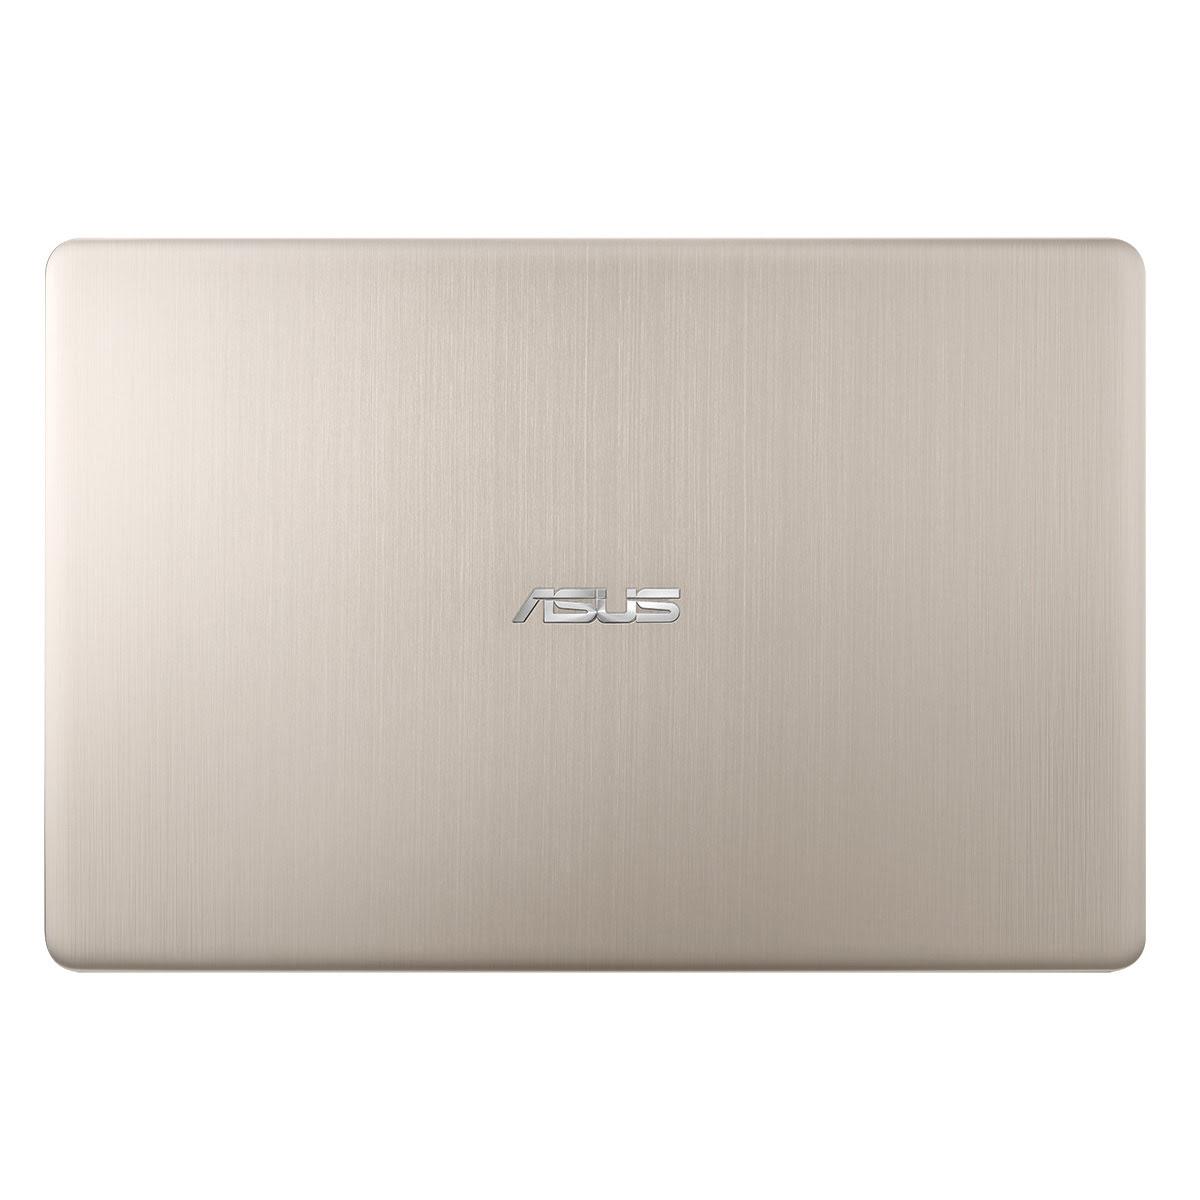 Asus 90NB0FQ5-M07070 - PC portable Asus - Cybertek.fr - 1